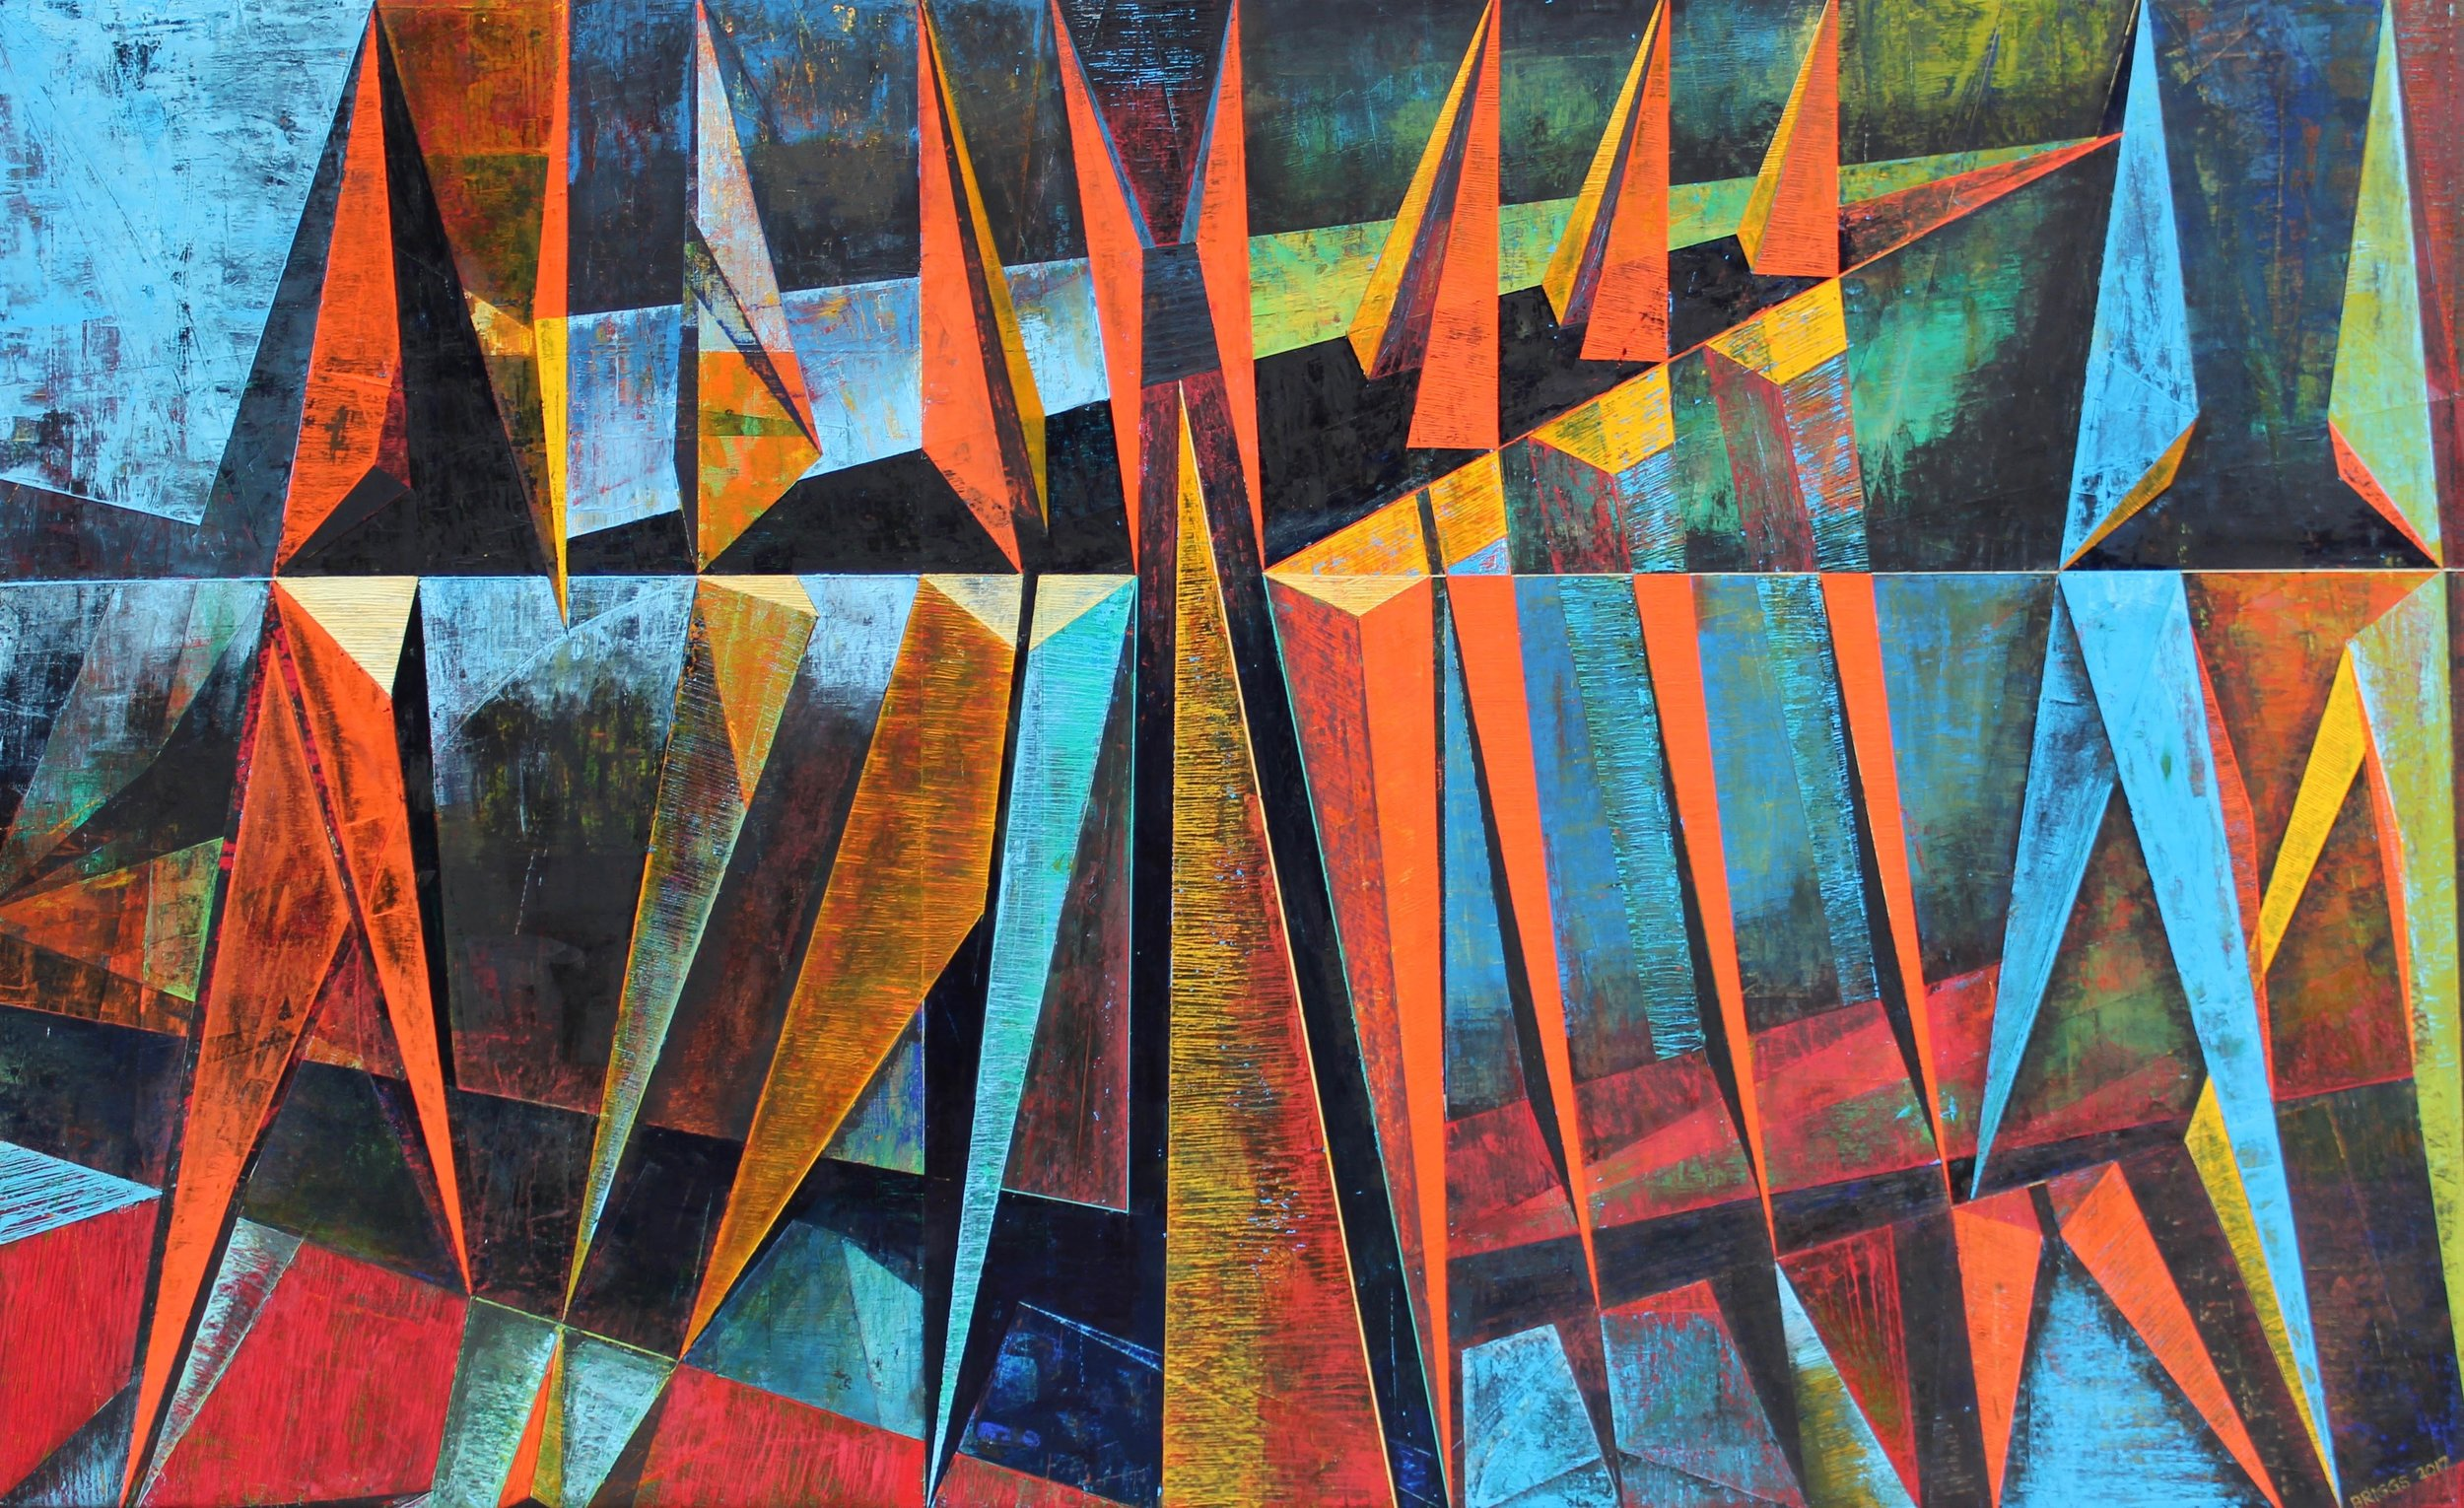 "2017 | Scrape No. 6_The Struggle | Oil on canvas | 38"" x 62"" (96.5 cm x 157.5 cm)  Collection of Jenn Crisan and Daniel Horne"